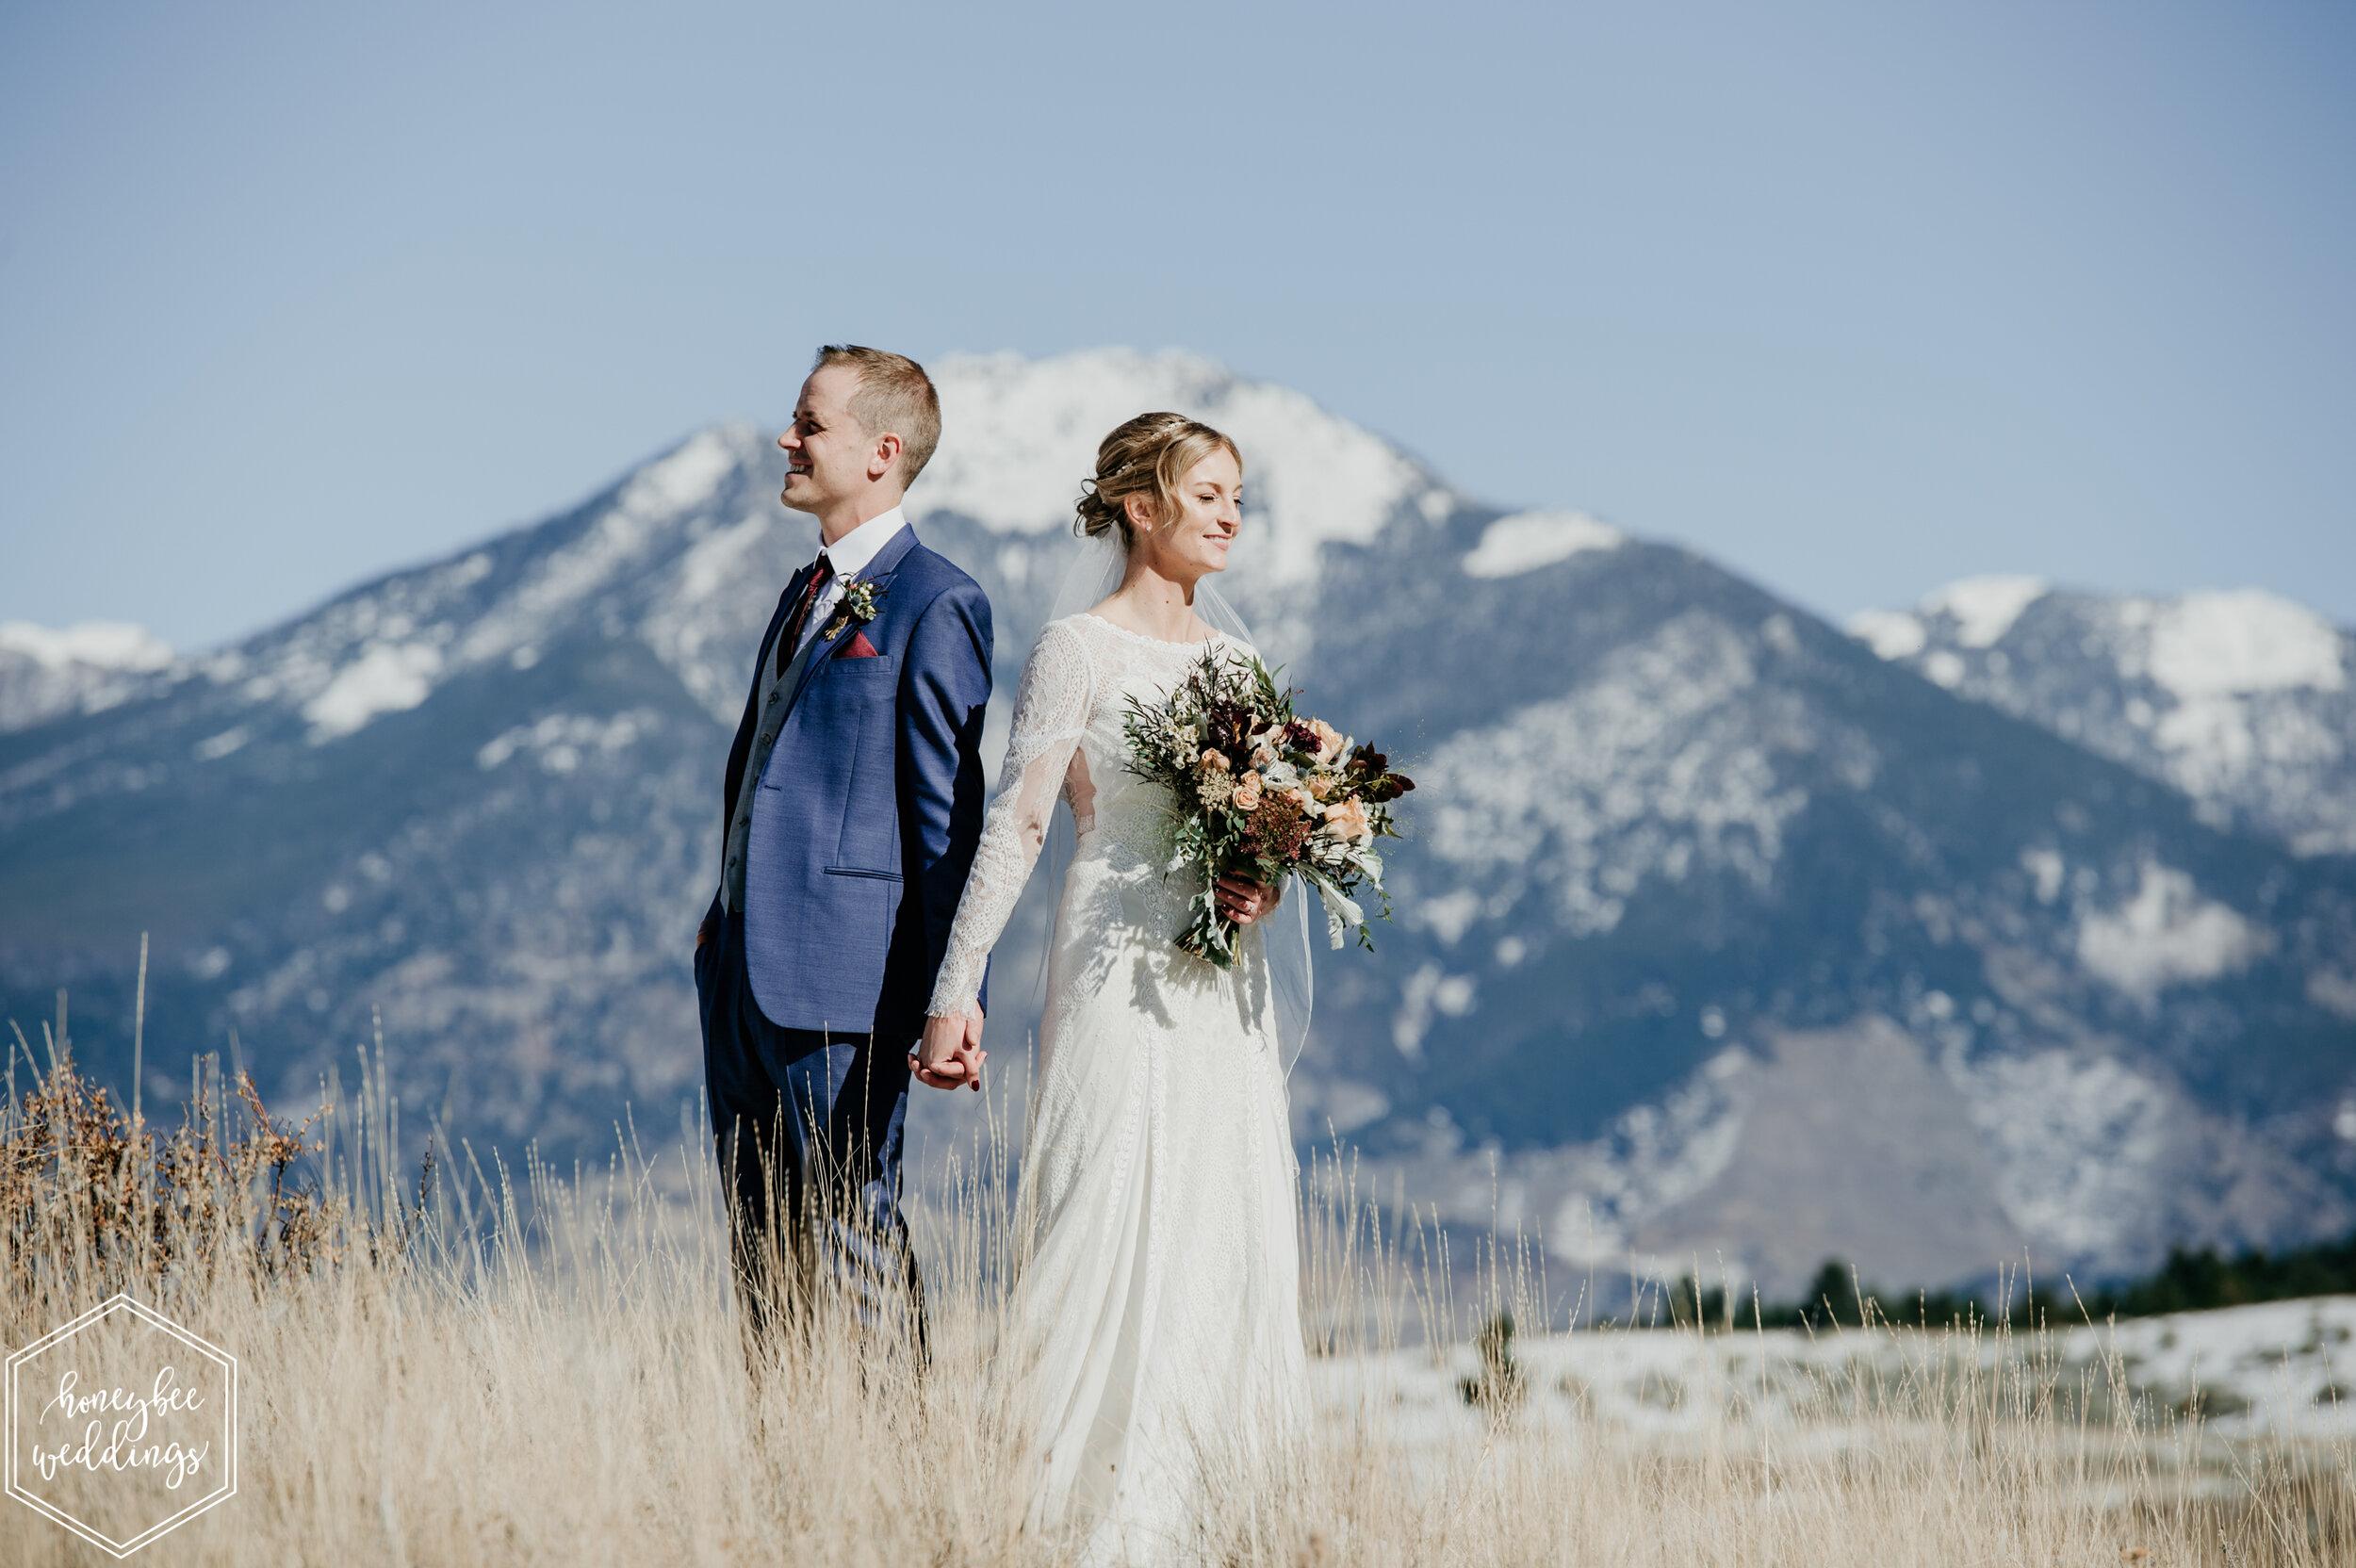 078Chico Hot Springs Wedding_Montana Wedding Photographer_Winter Wedding_Ariel & Richard_October 12, 2019-2123.jpg